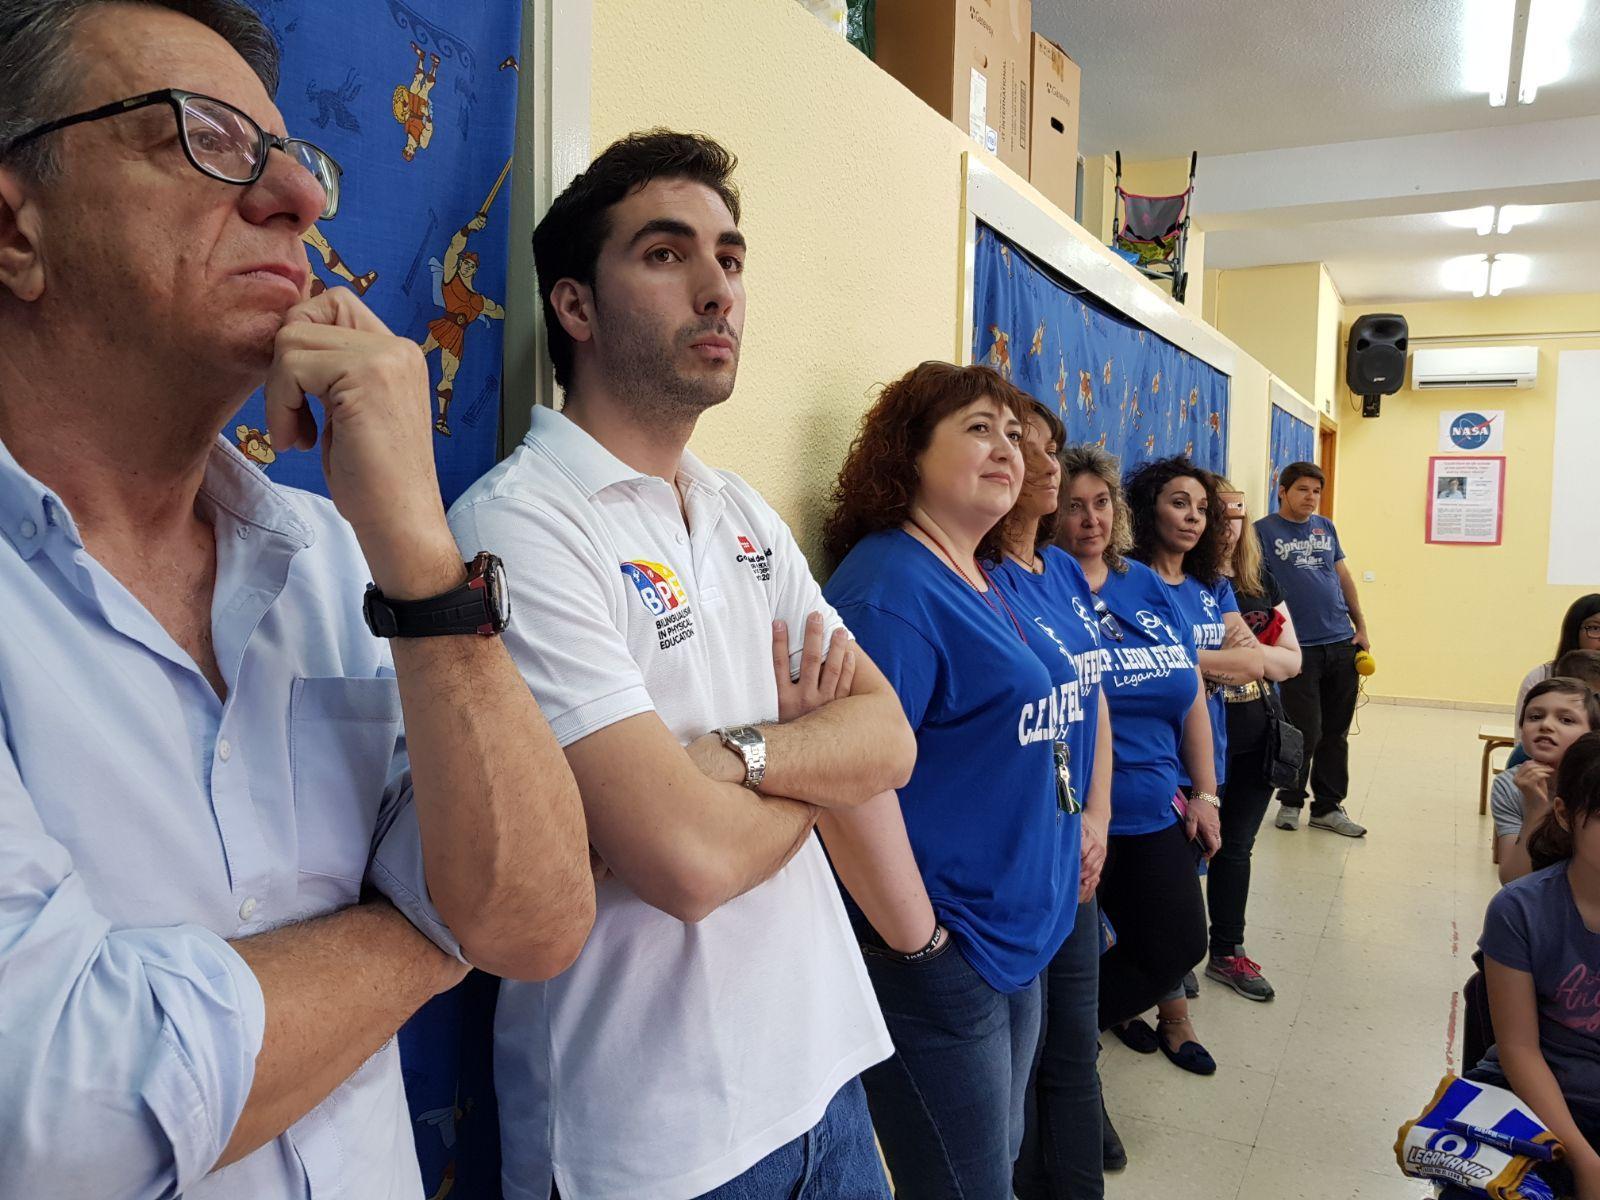 Los jugadores del C.F. Leganés visitan el cole 7